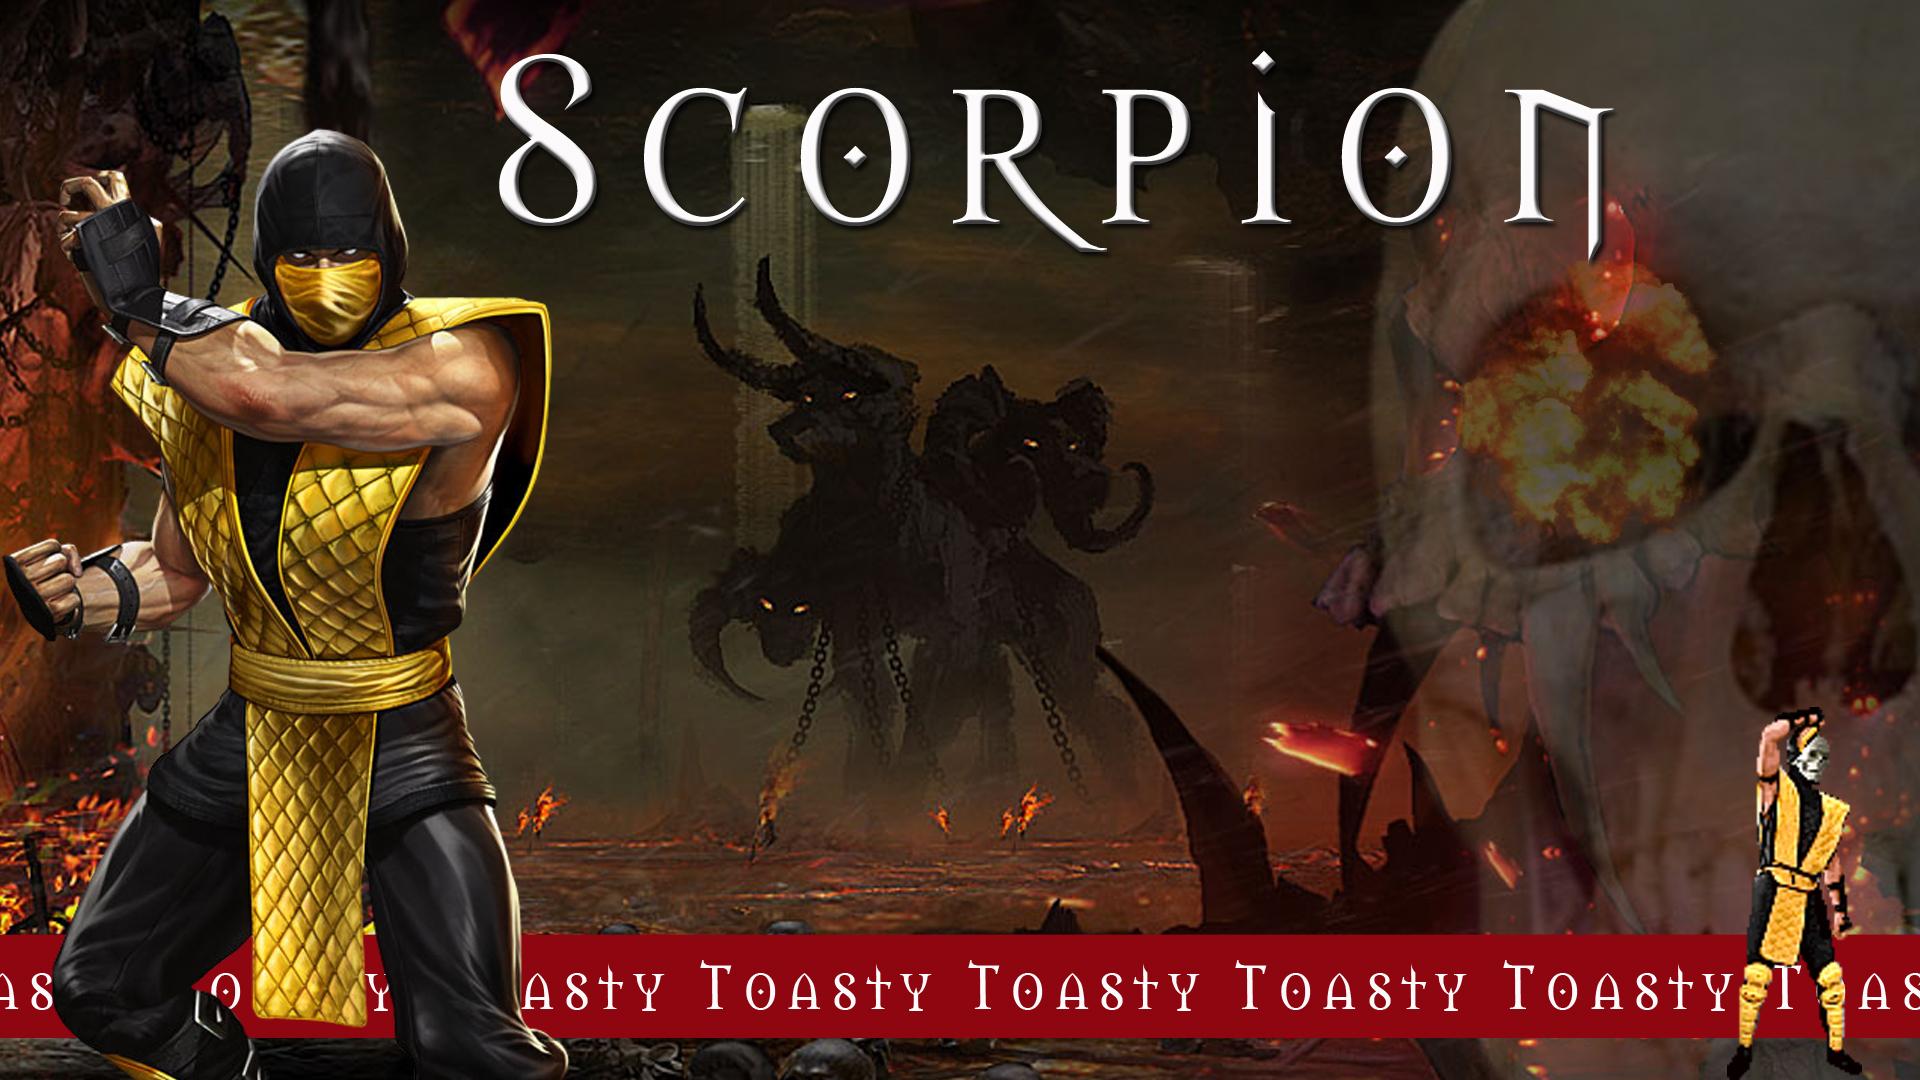 mortal kombat scorpion wallpaper android